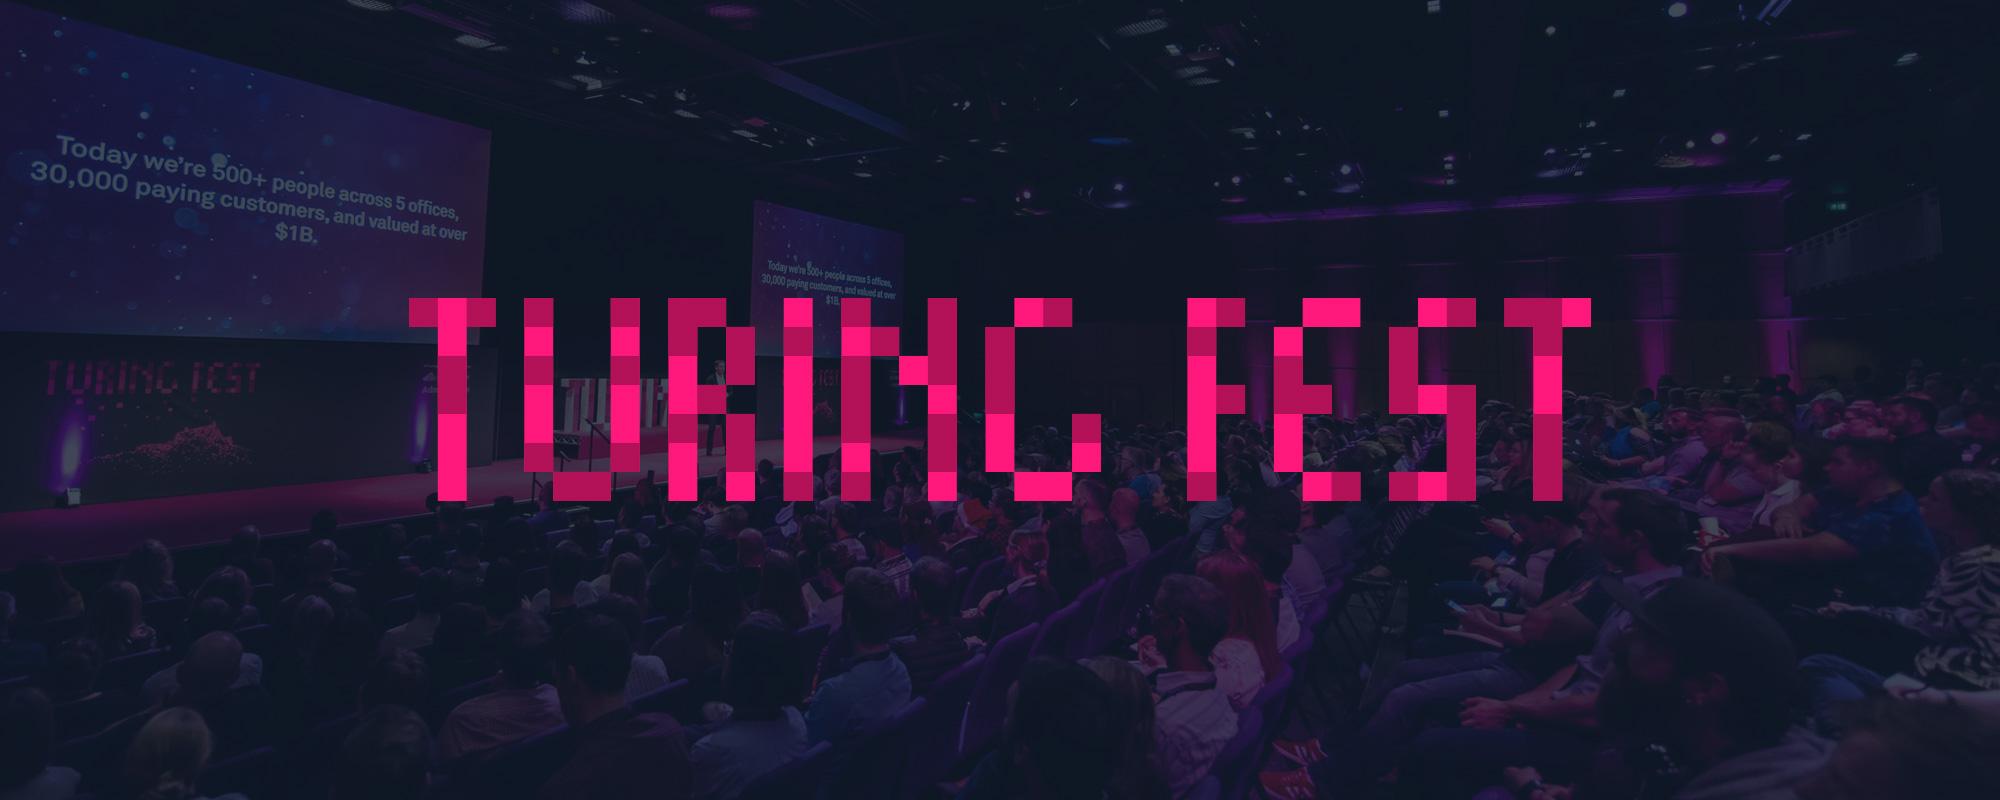 Turing-banner.jpg